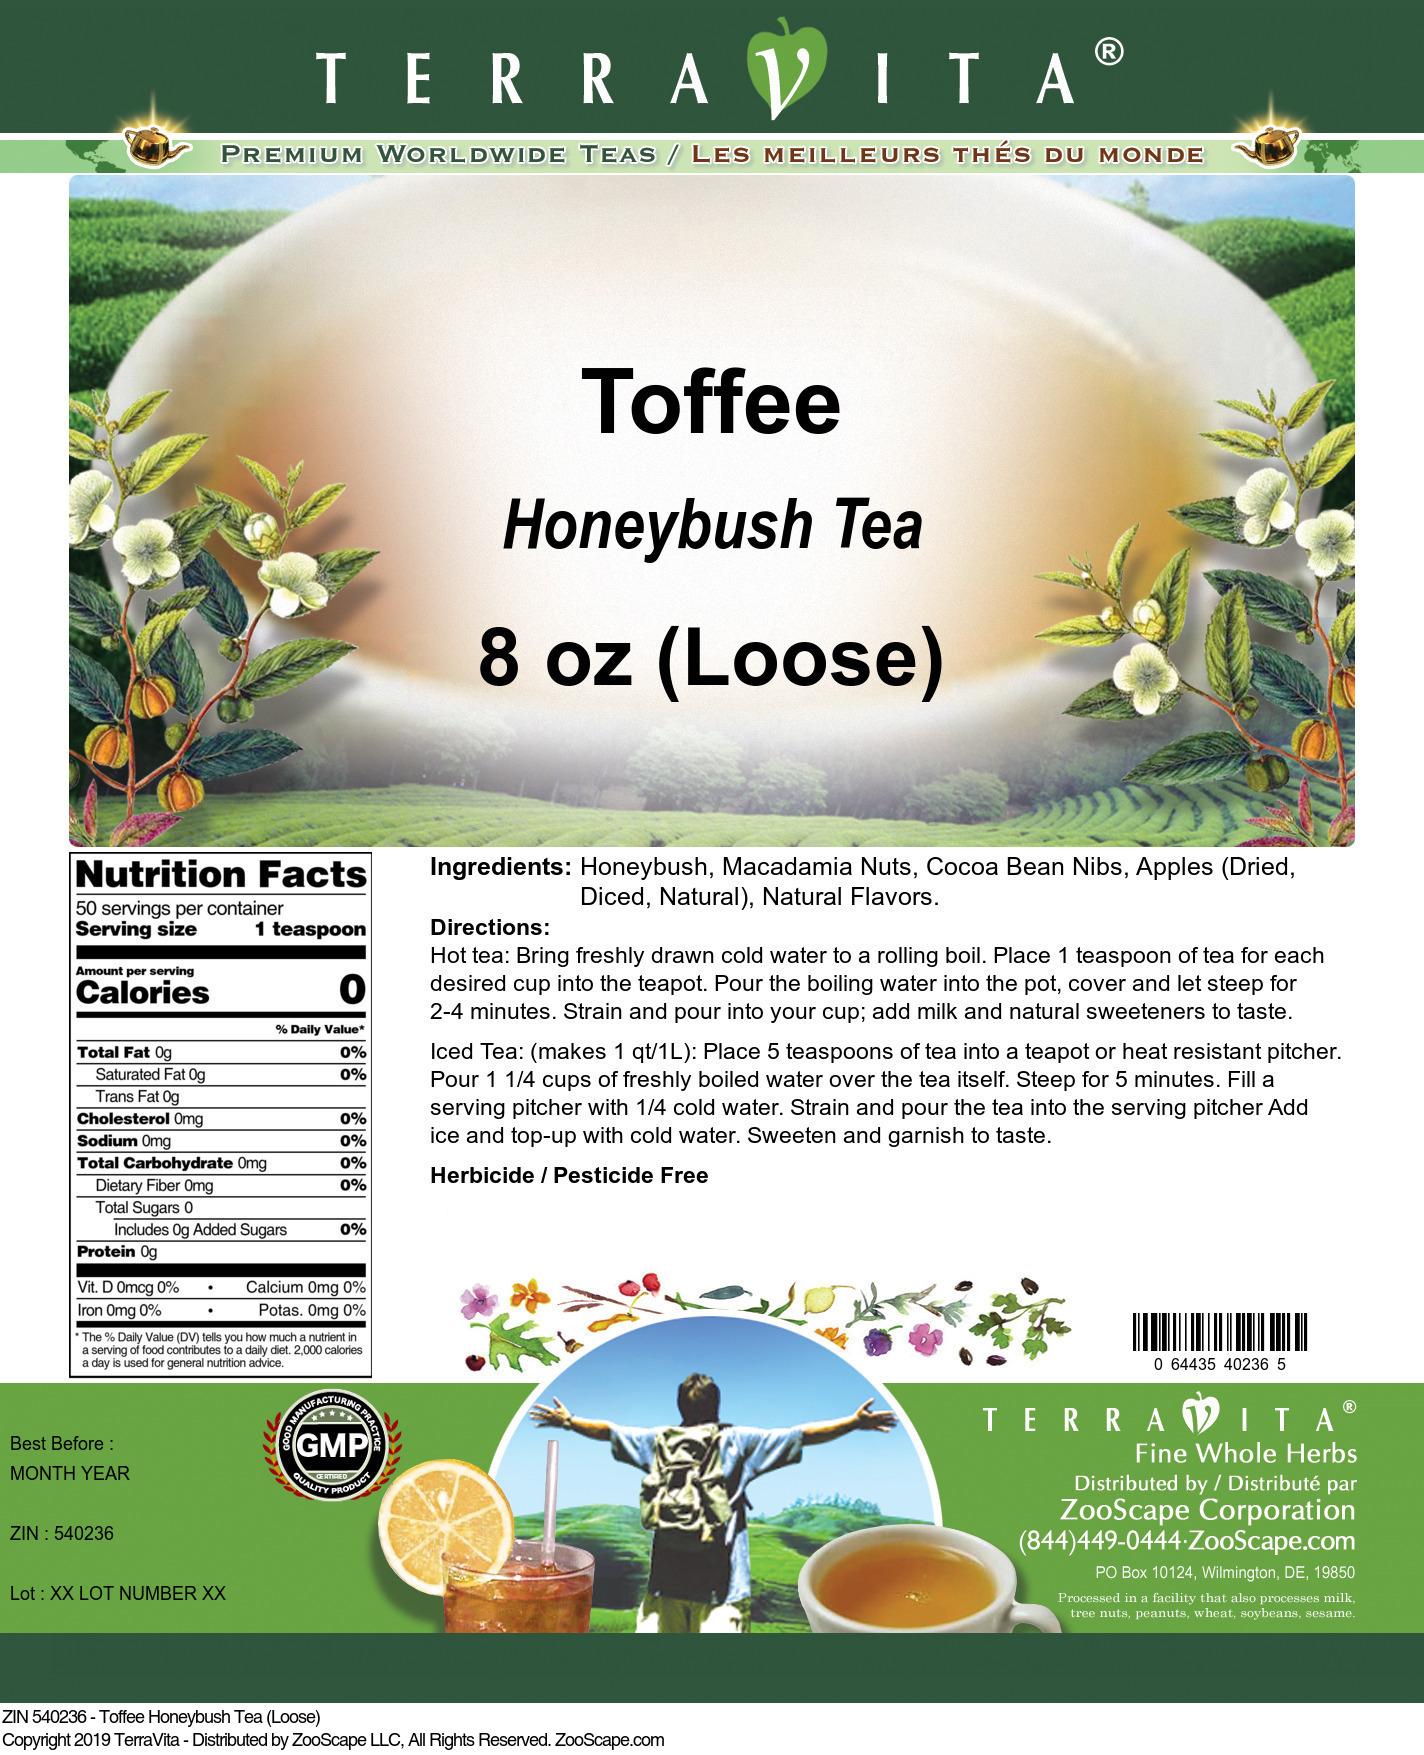 Toffee Honeybush Tea